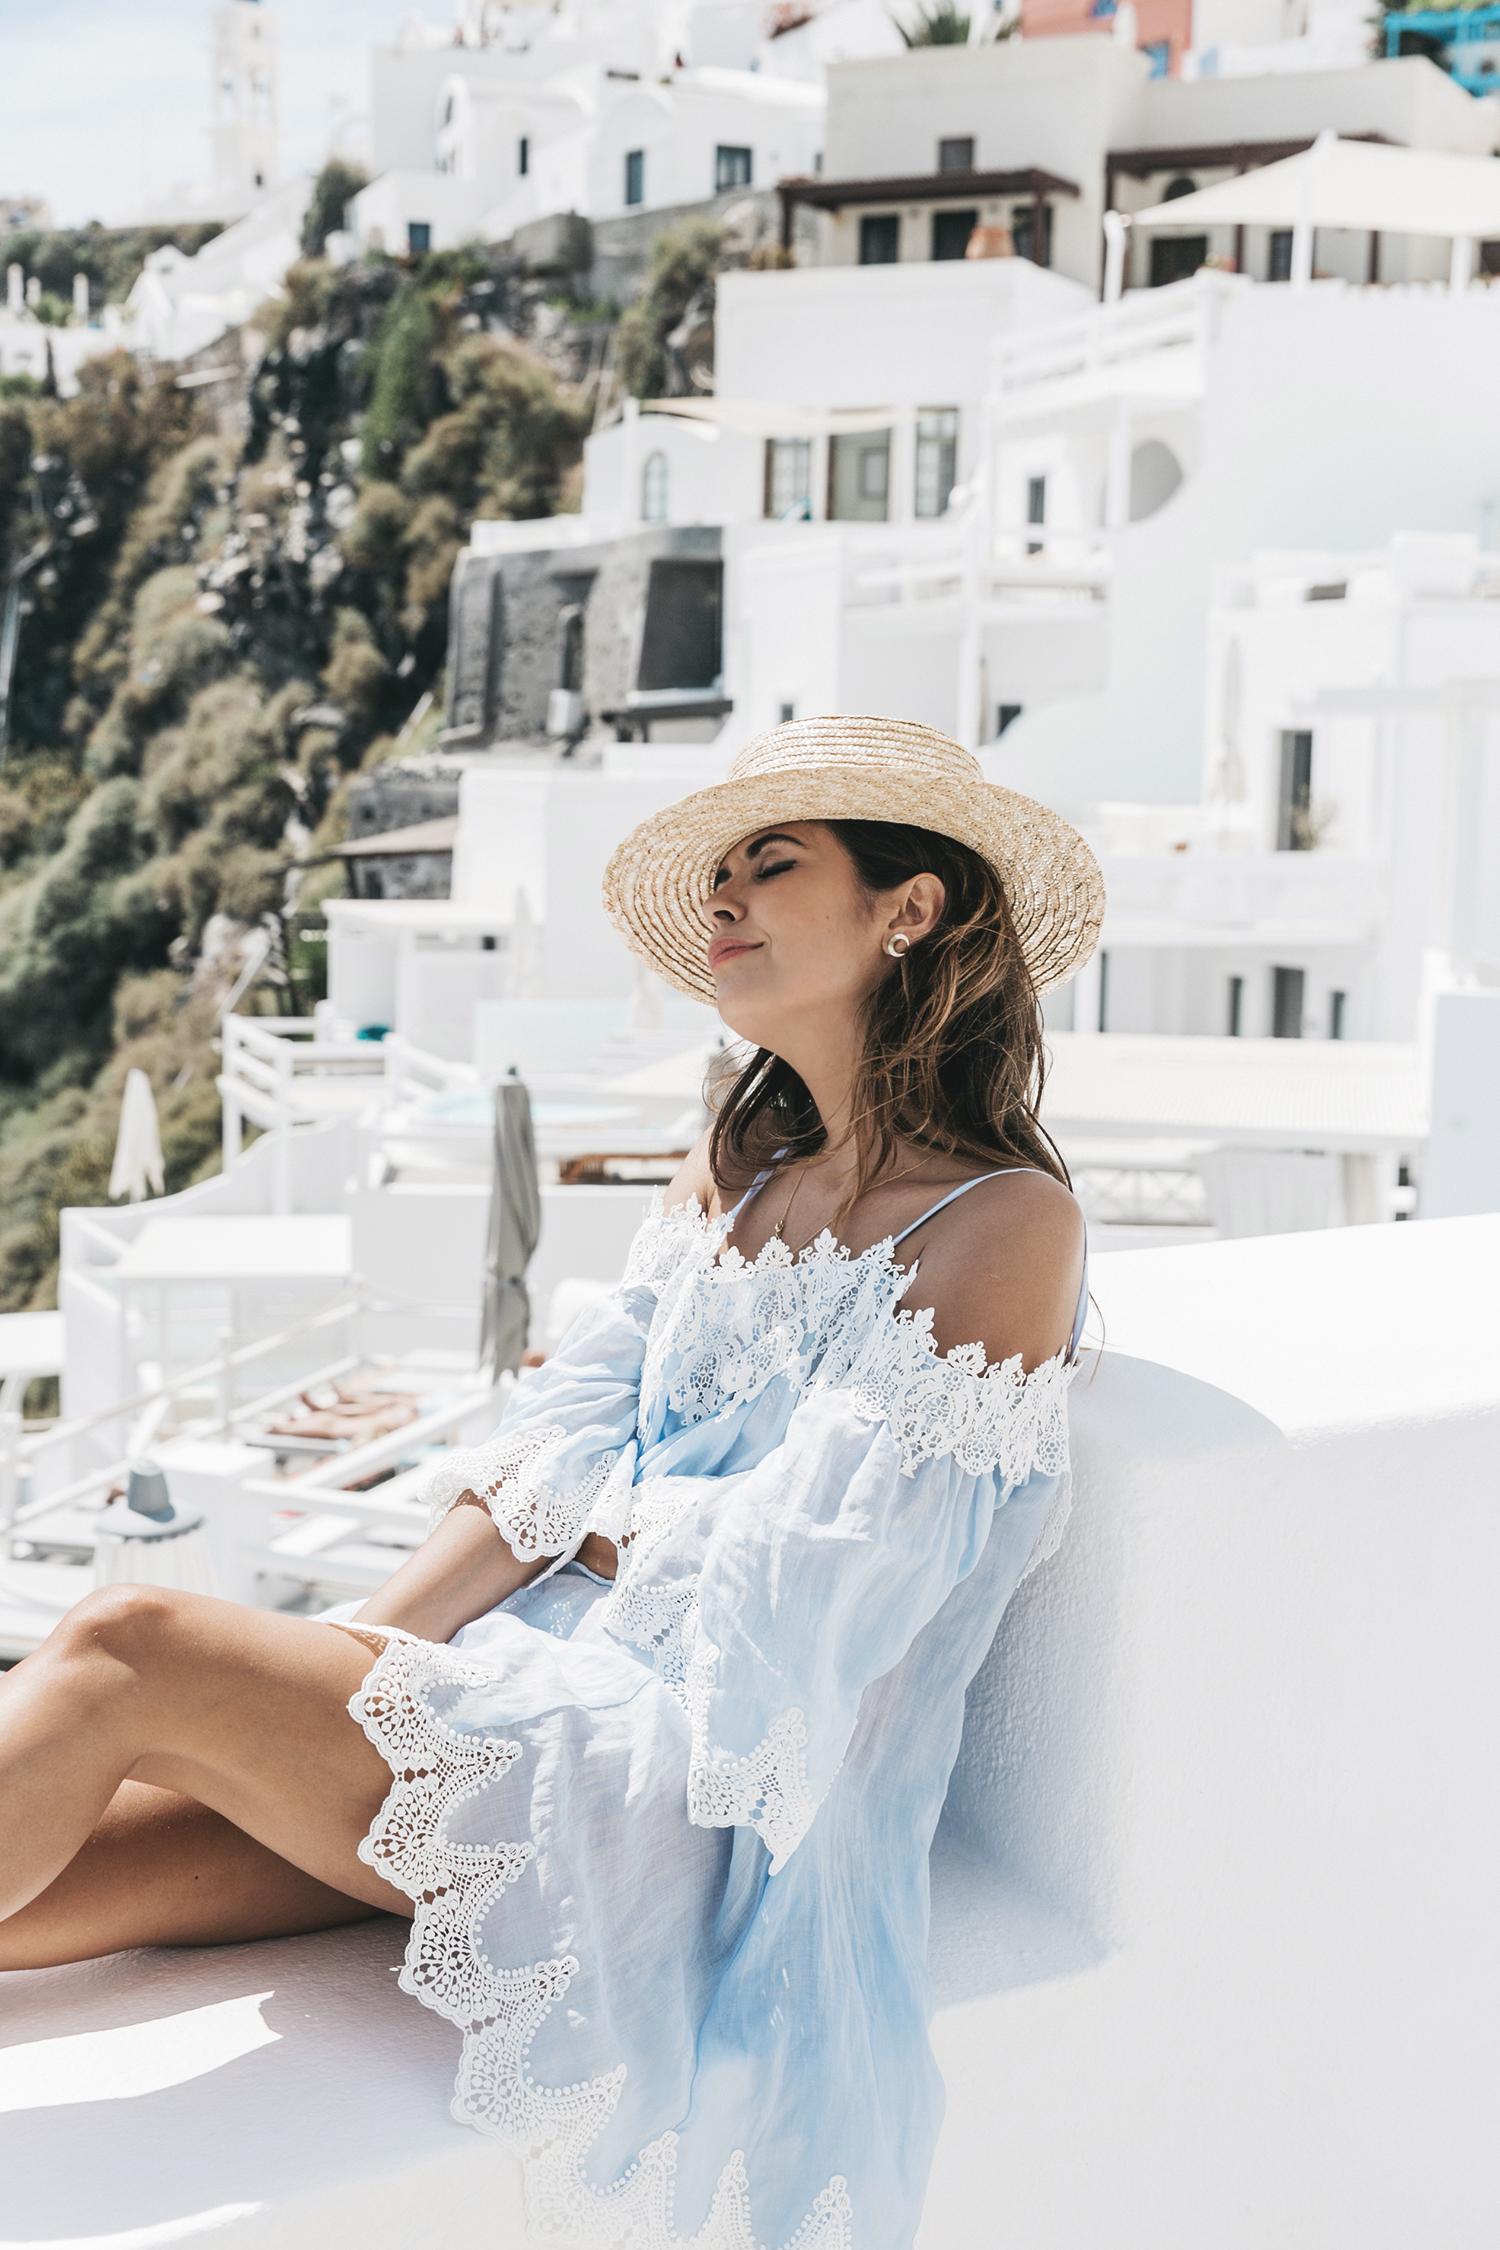 Blue_Dress-Soludos_Escapes-Soludos_Espadrilles-Canotier-Hat-Lack_Of_Color-Summer-Santorini-Collage_Vintage-48